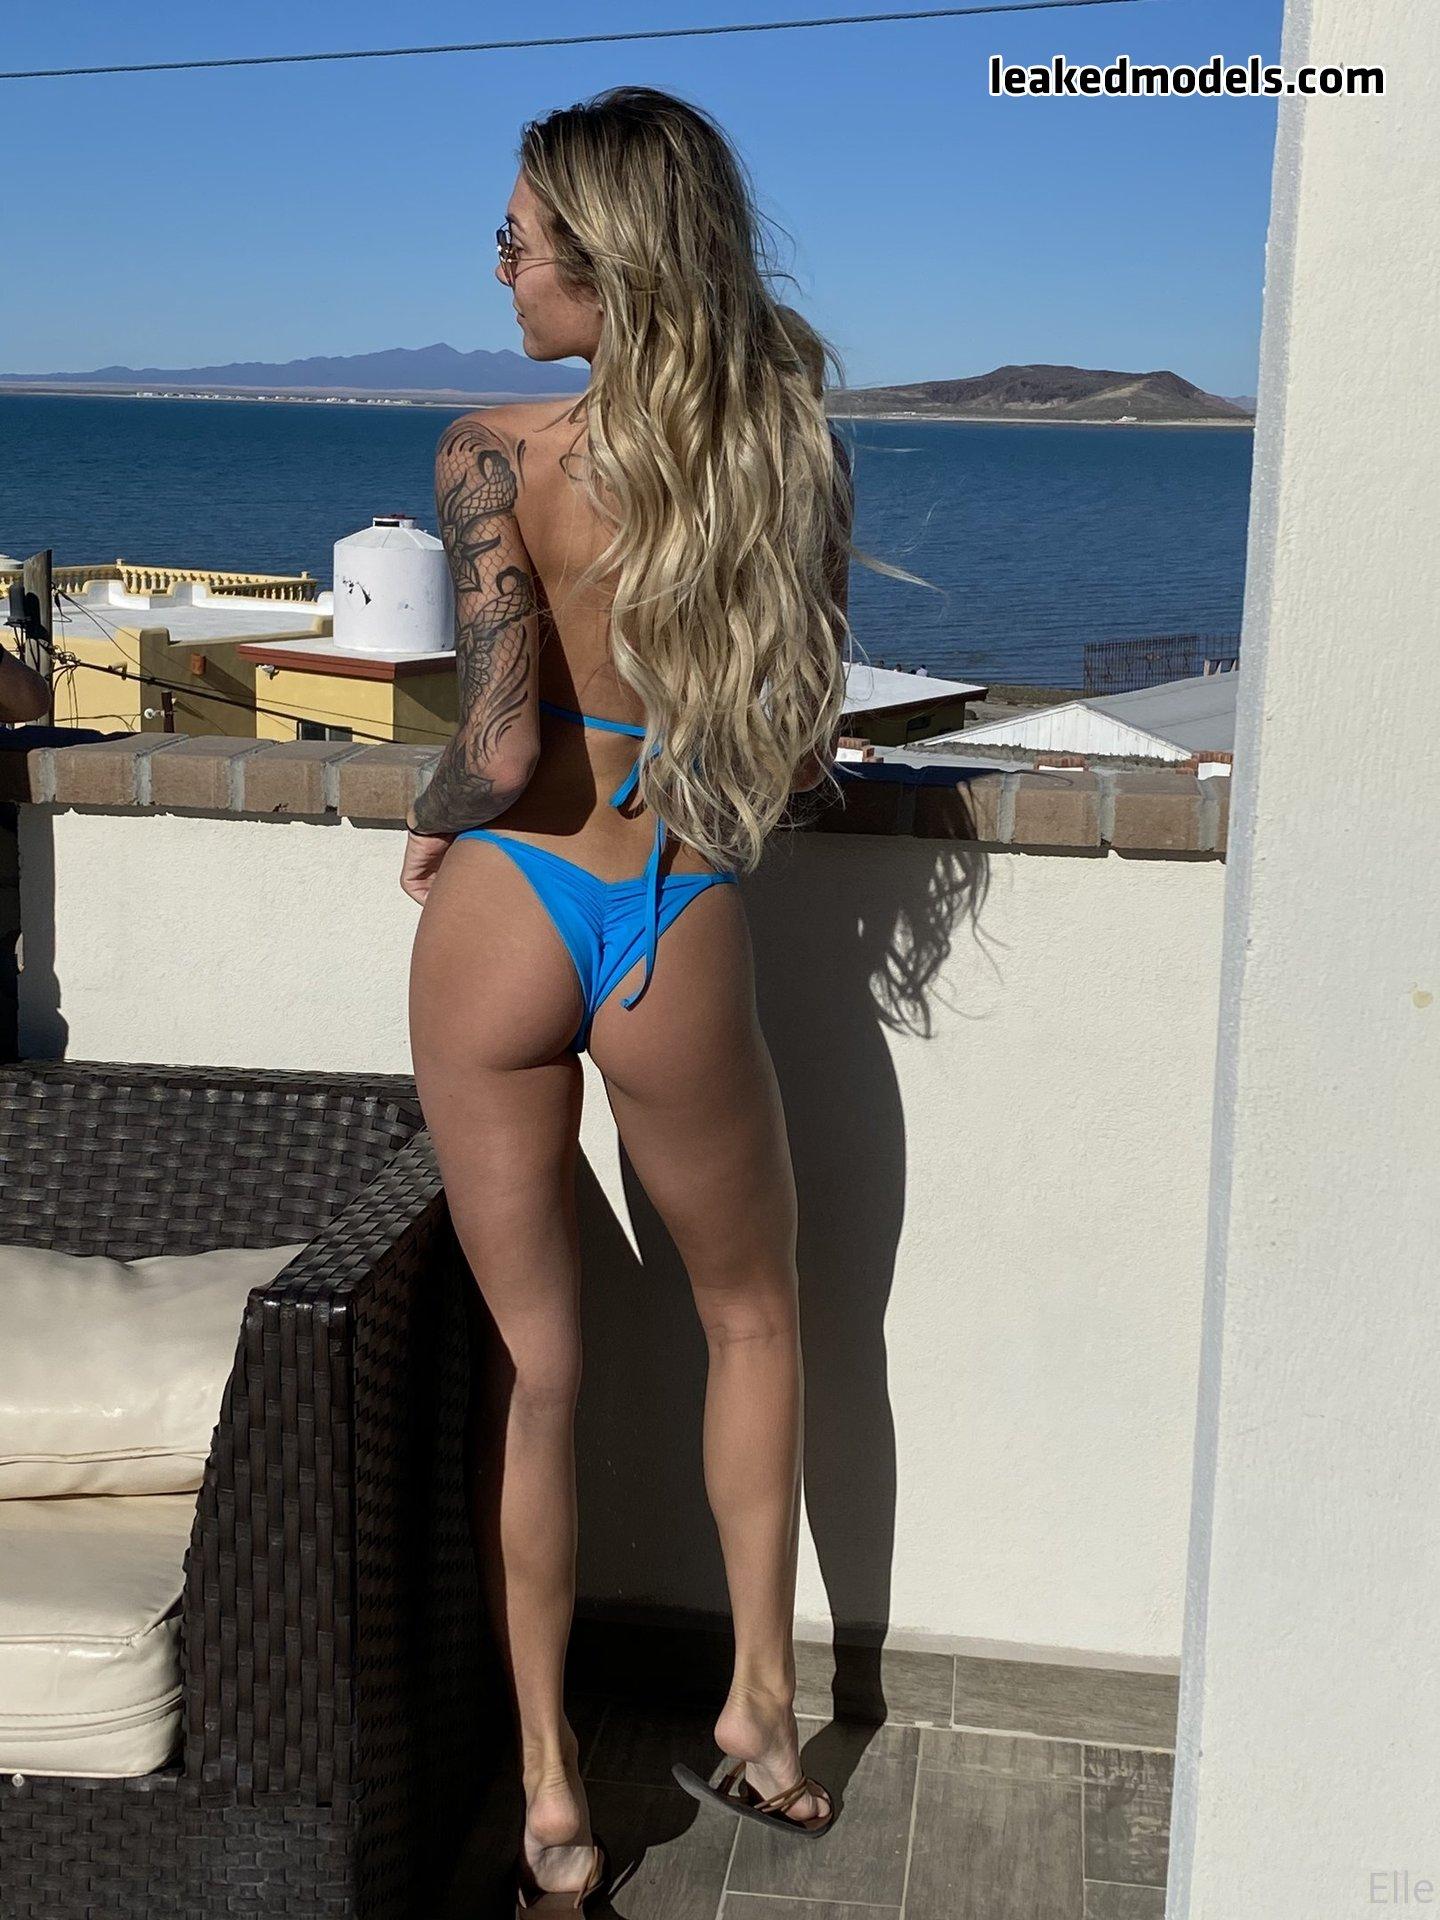 ellebelle1 leaked nude leakedmodels.com 0031 - Elle – ellebelle1 OnlyFans Nude Leaks (40 Photos)